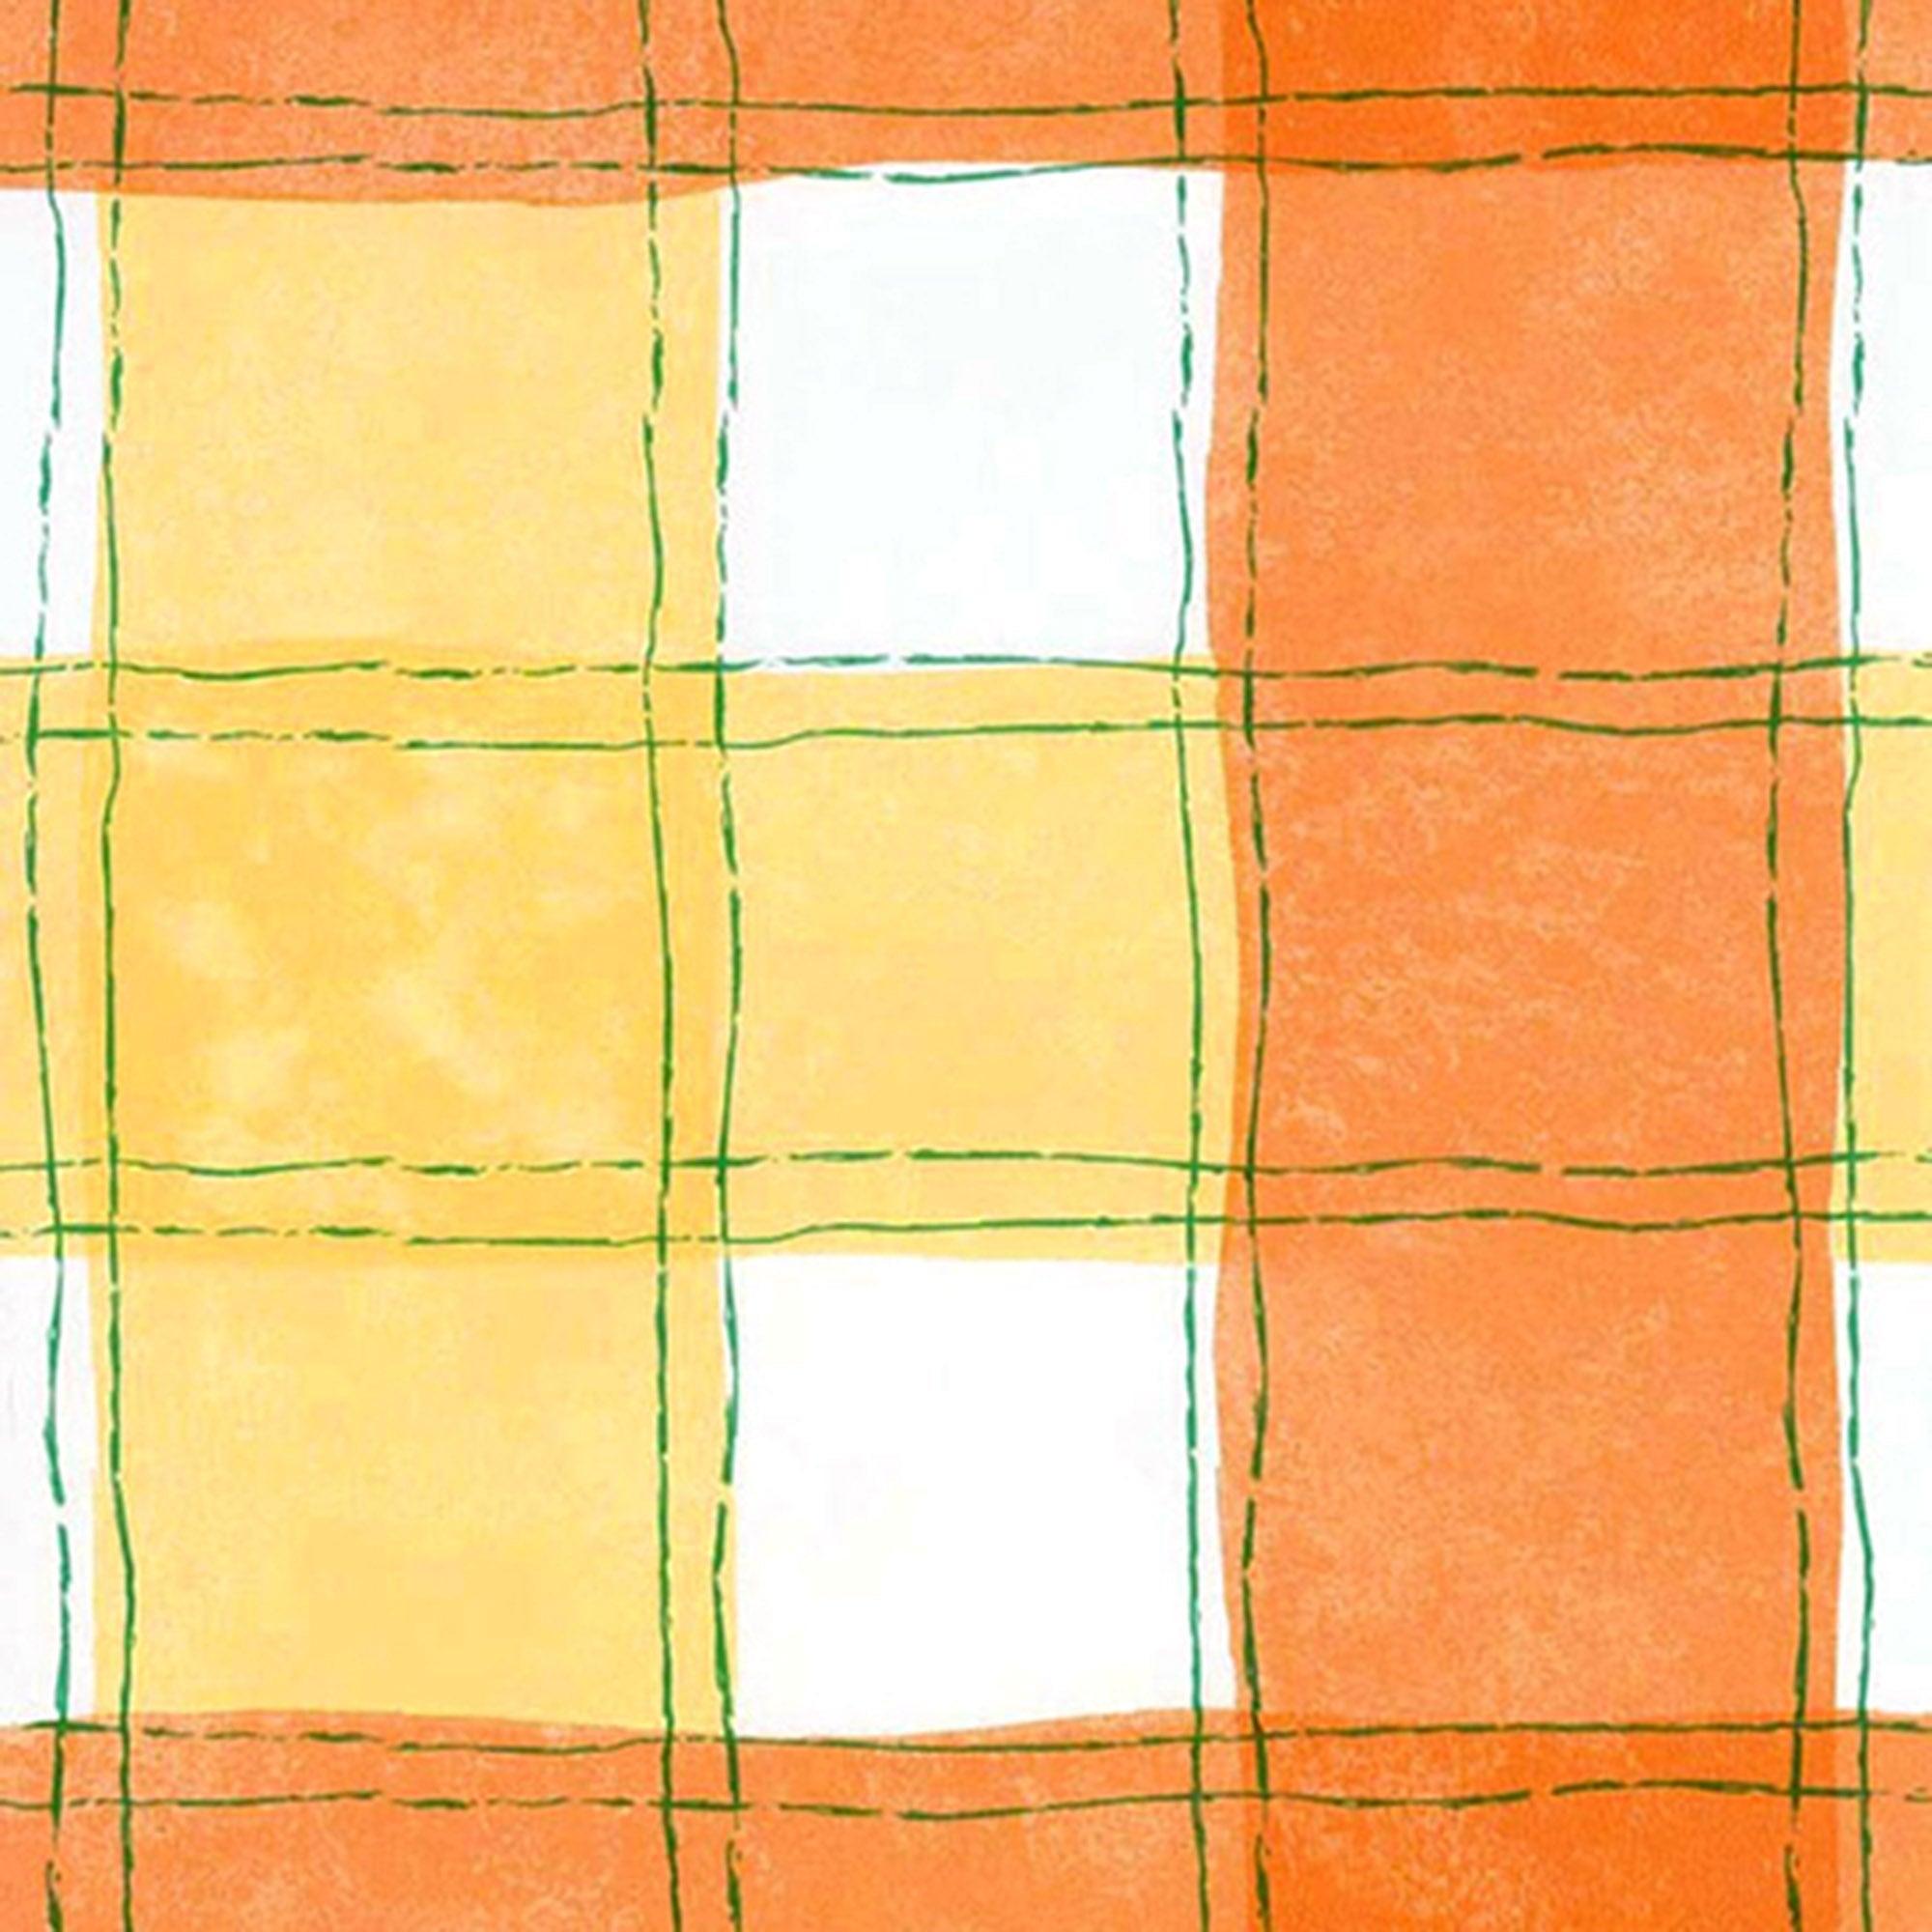 Wavy Check PVC Fabric